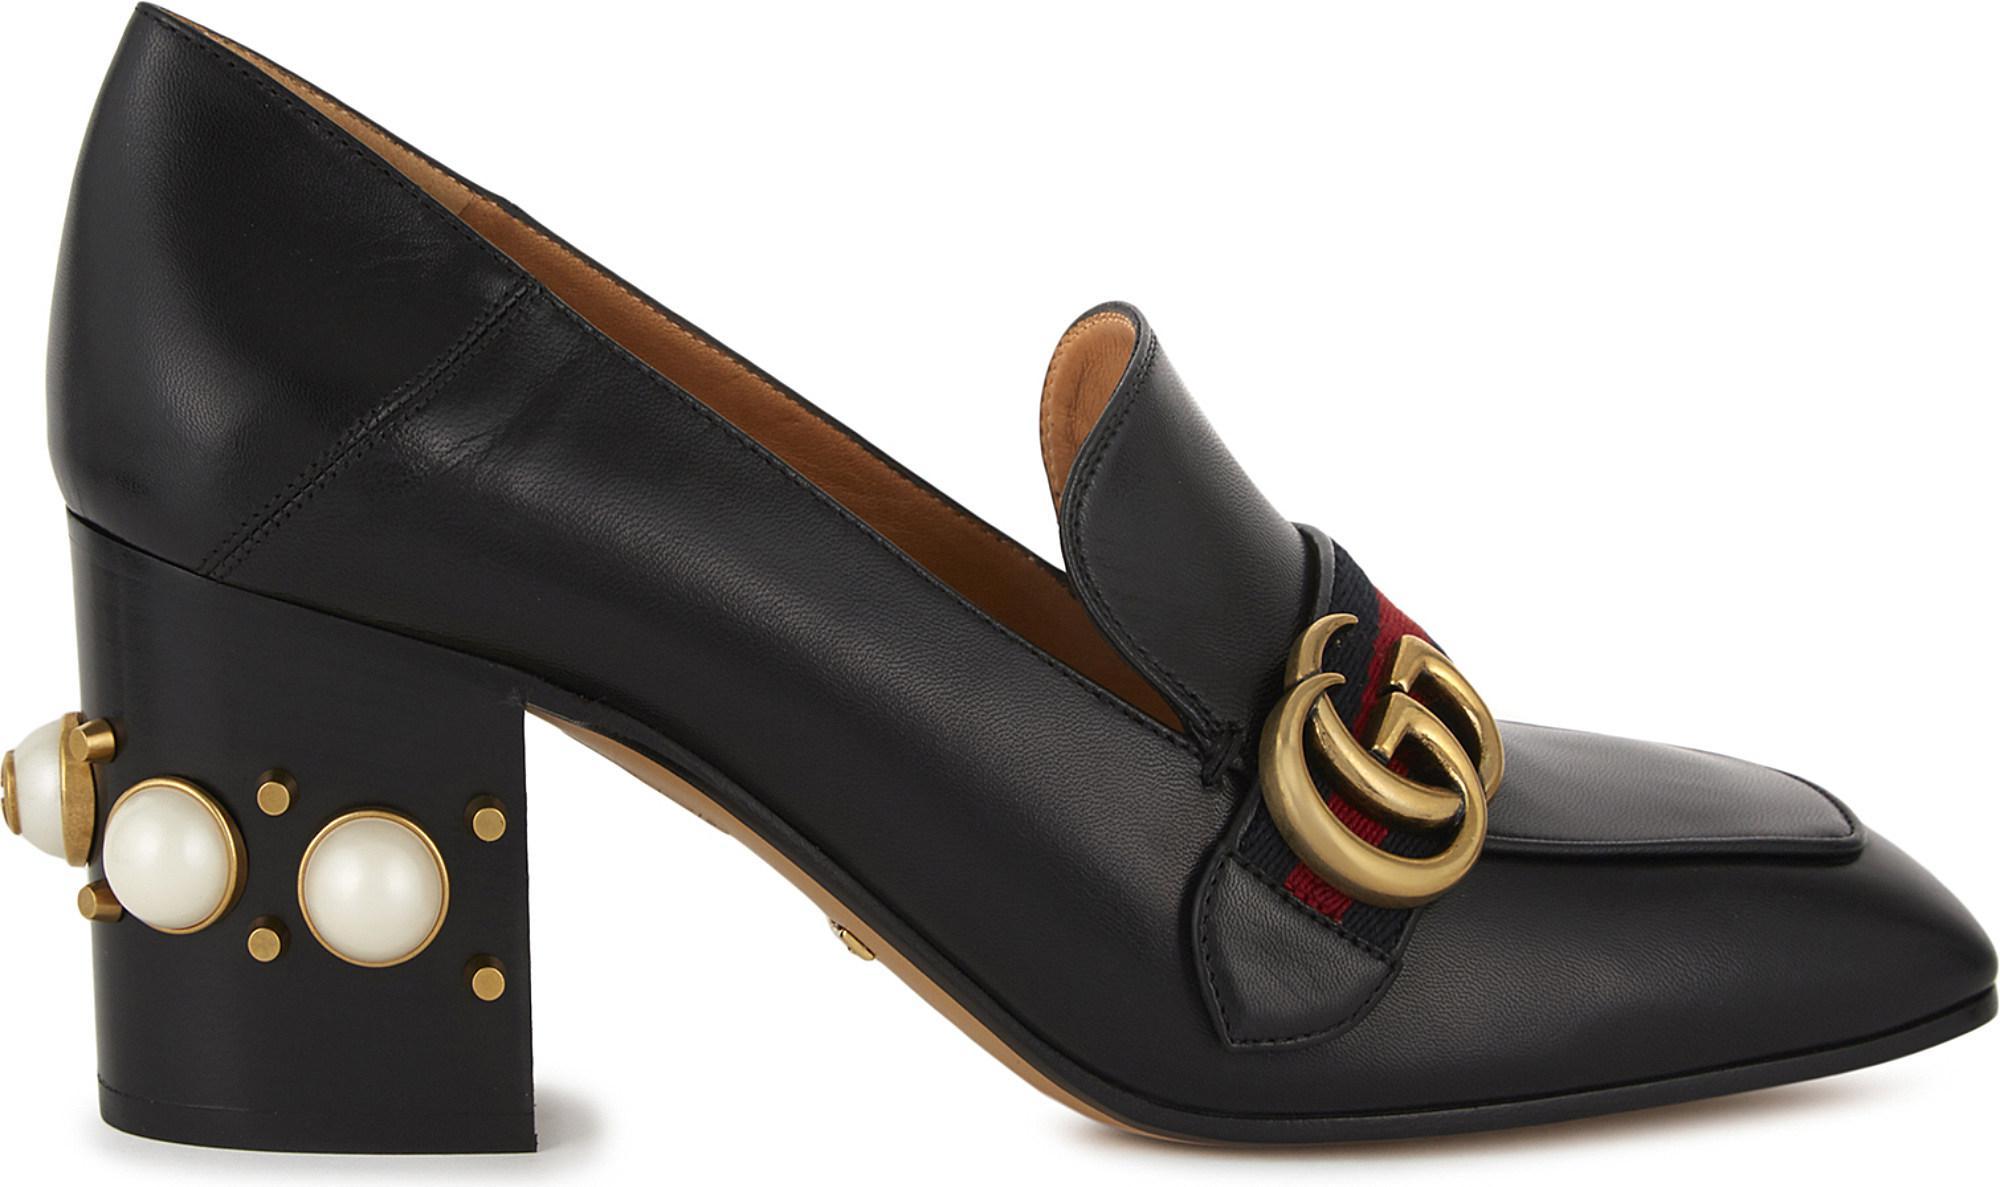 7a7e8c3b3f0f Lyst - Gucci Peyton Pearl 75 Leather Mules in Black